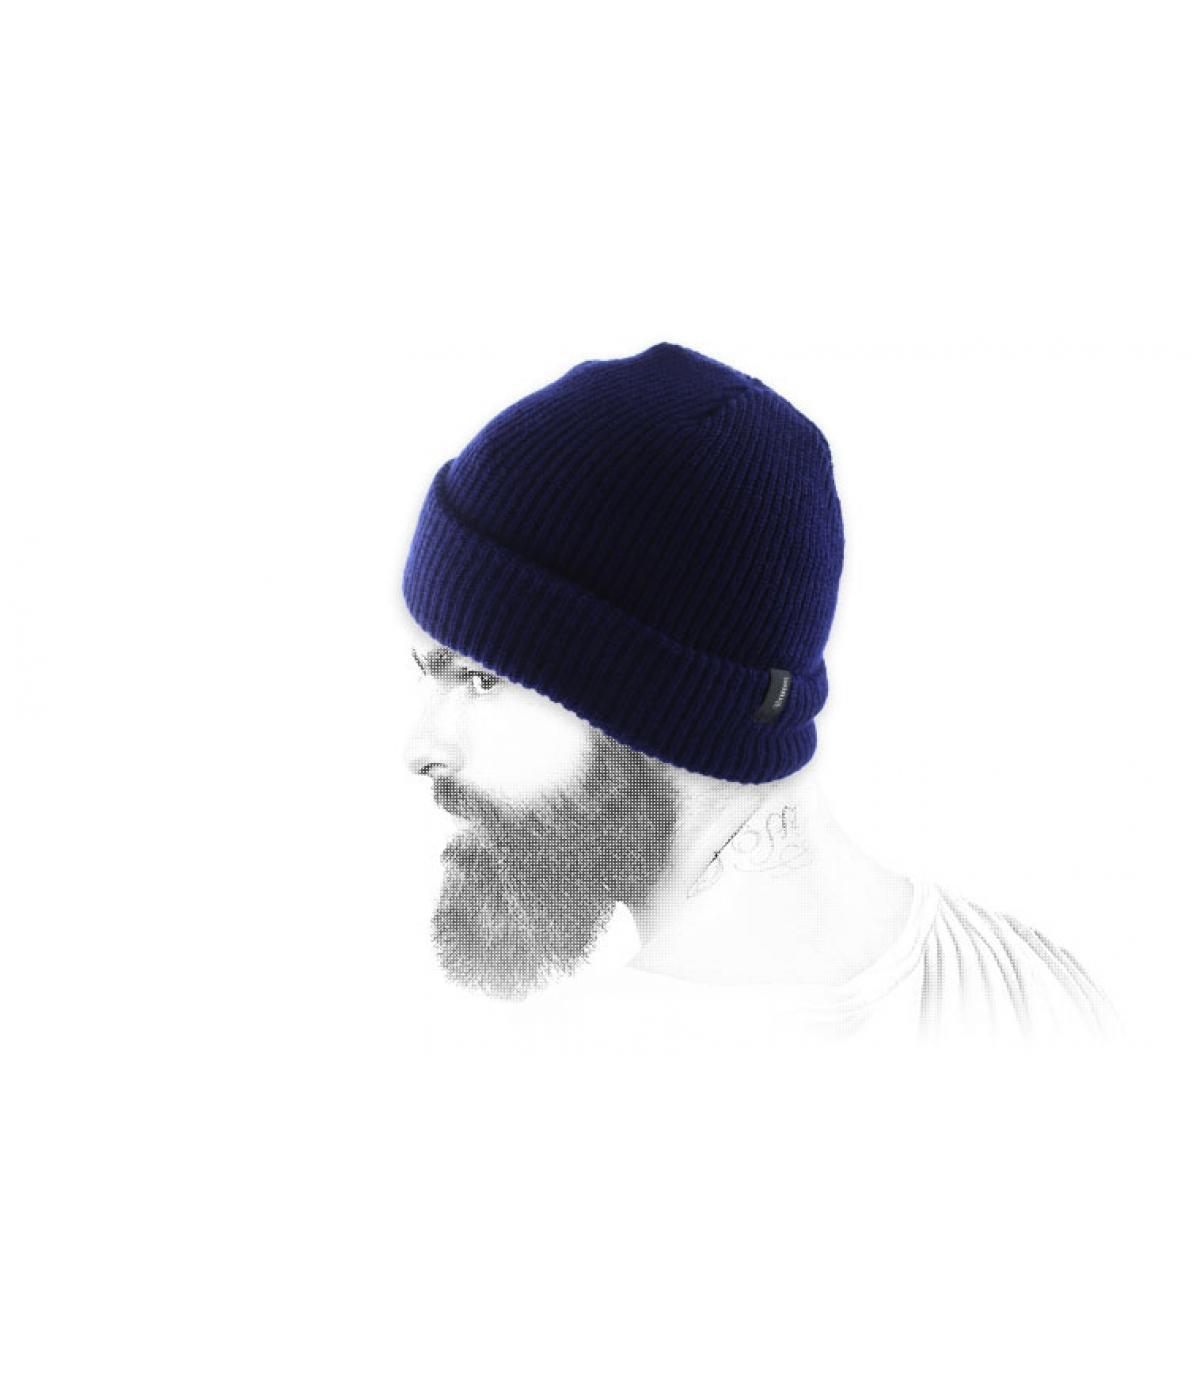 Marineblaue Brixton Mütze